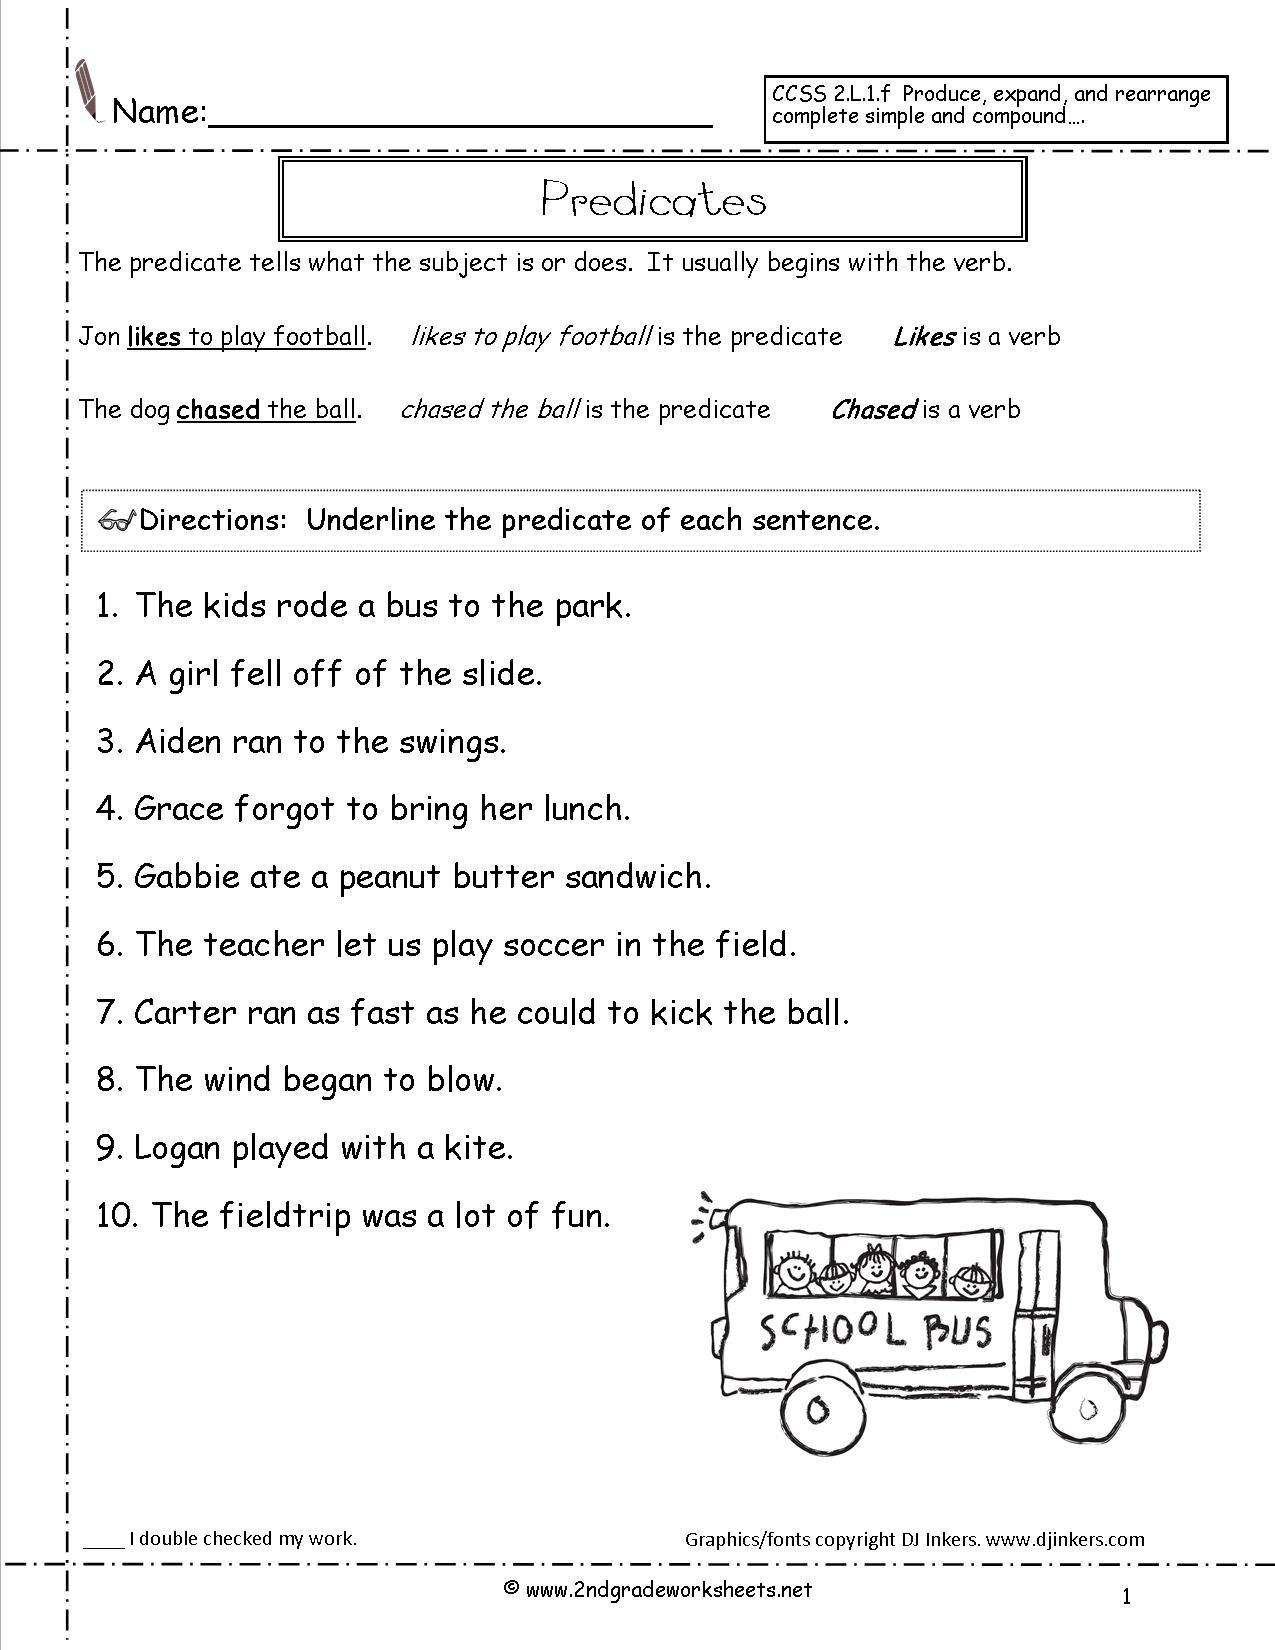 Complete Sentence Worksheets 3rd Grade Second Grade Sentences Worksheets Ccss 2 L 1 F Worksheets